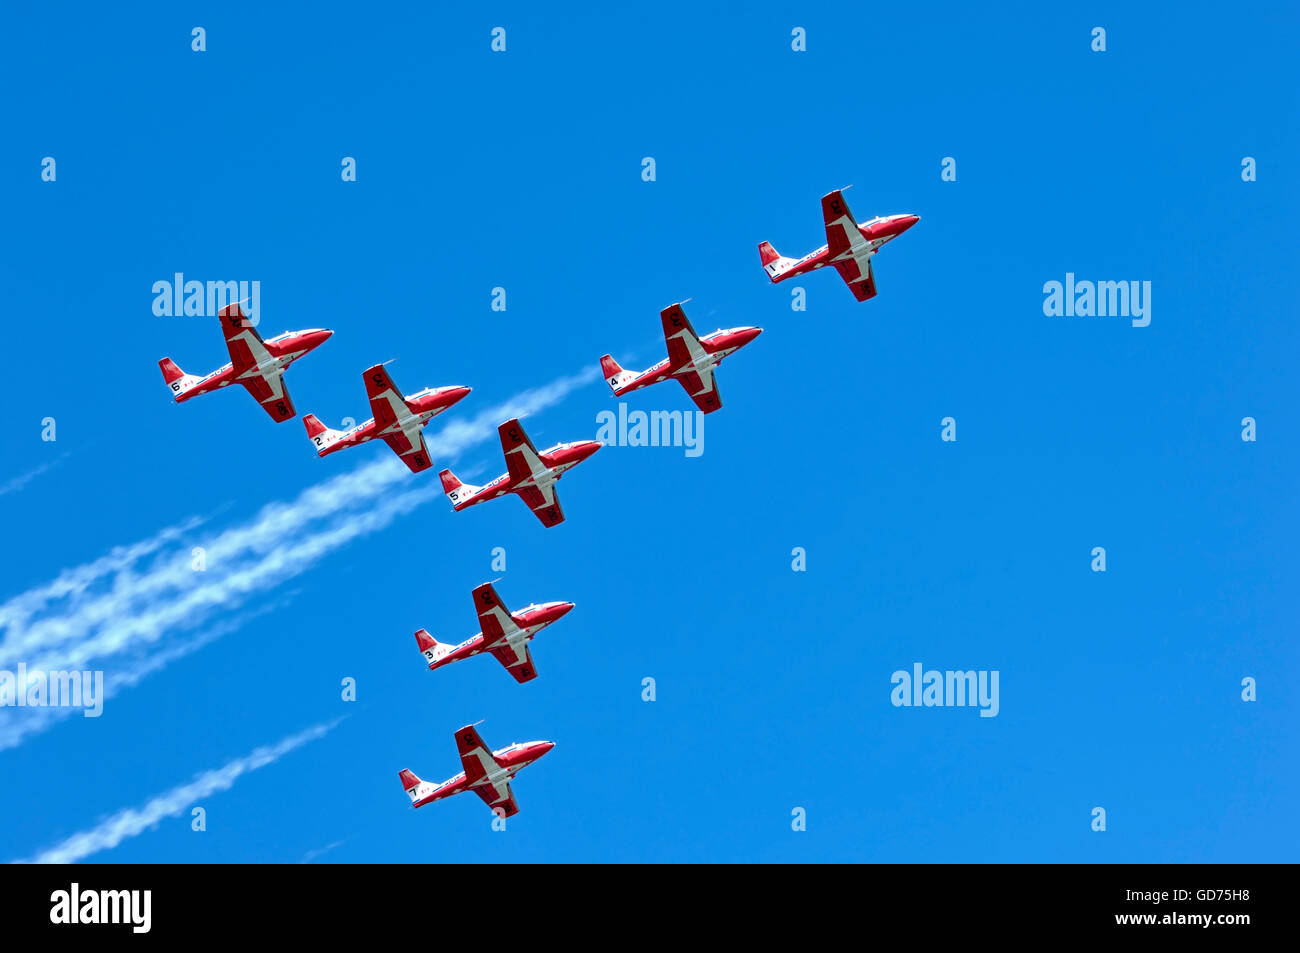 The Canadian Forces Snowbirds aerobatic team, Canadian International Air Show, Toronto, Ontario, Canada - Stock Image